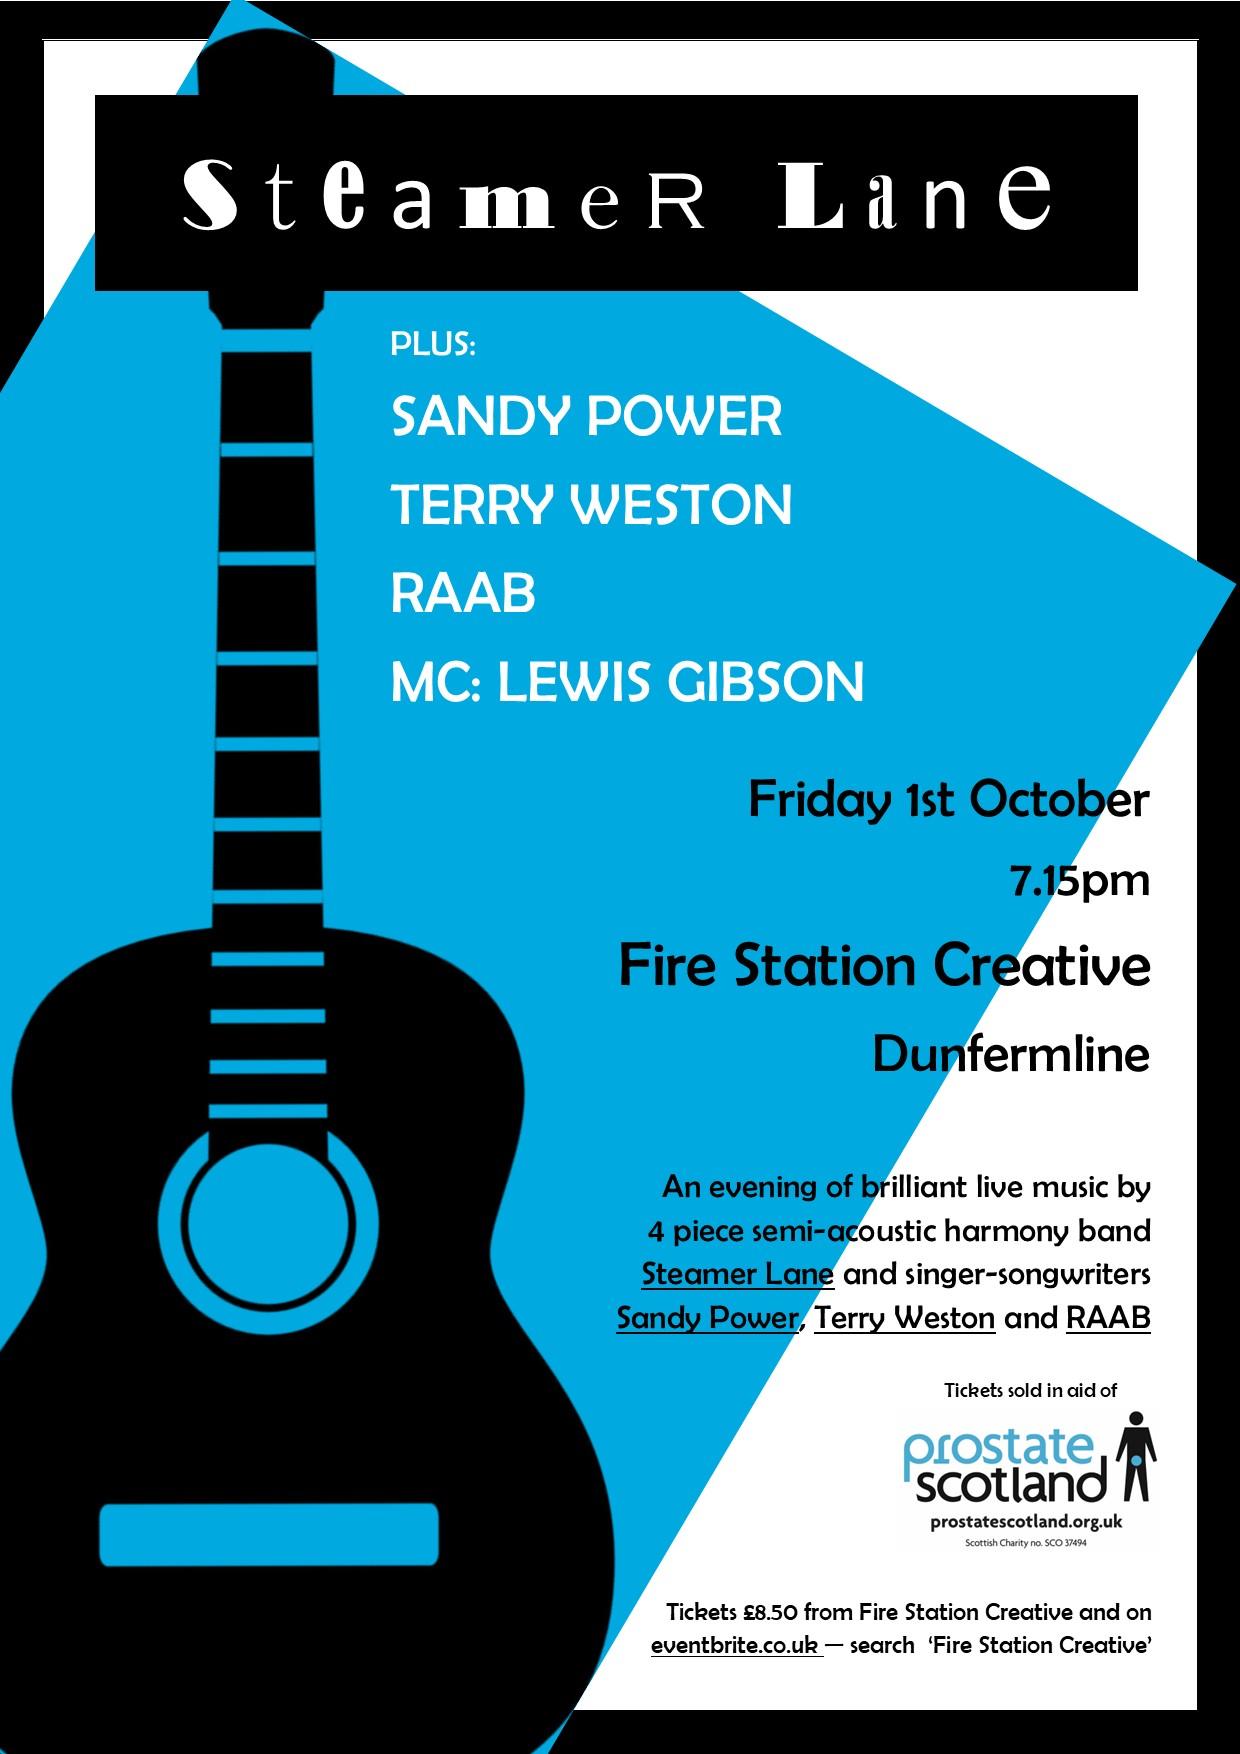 Steamer Lane Concert Poster 2021